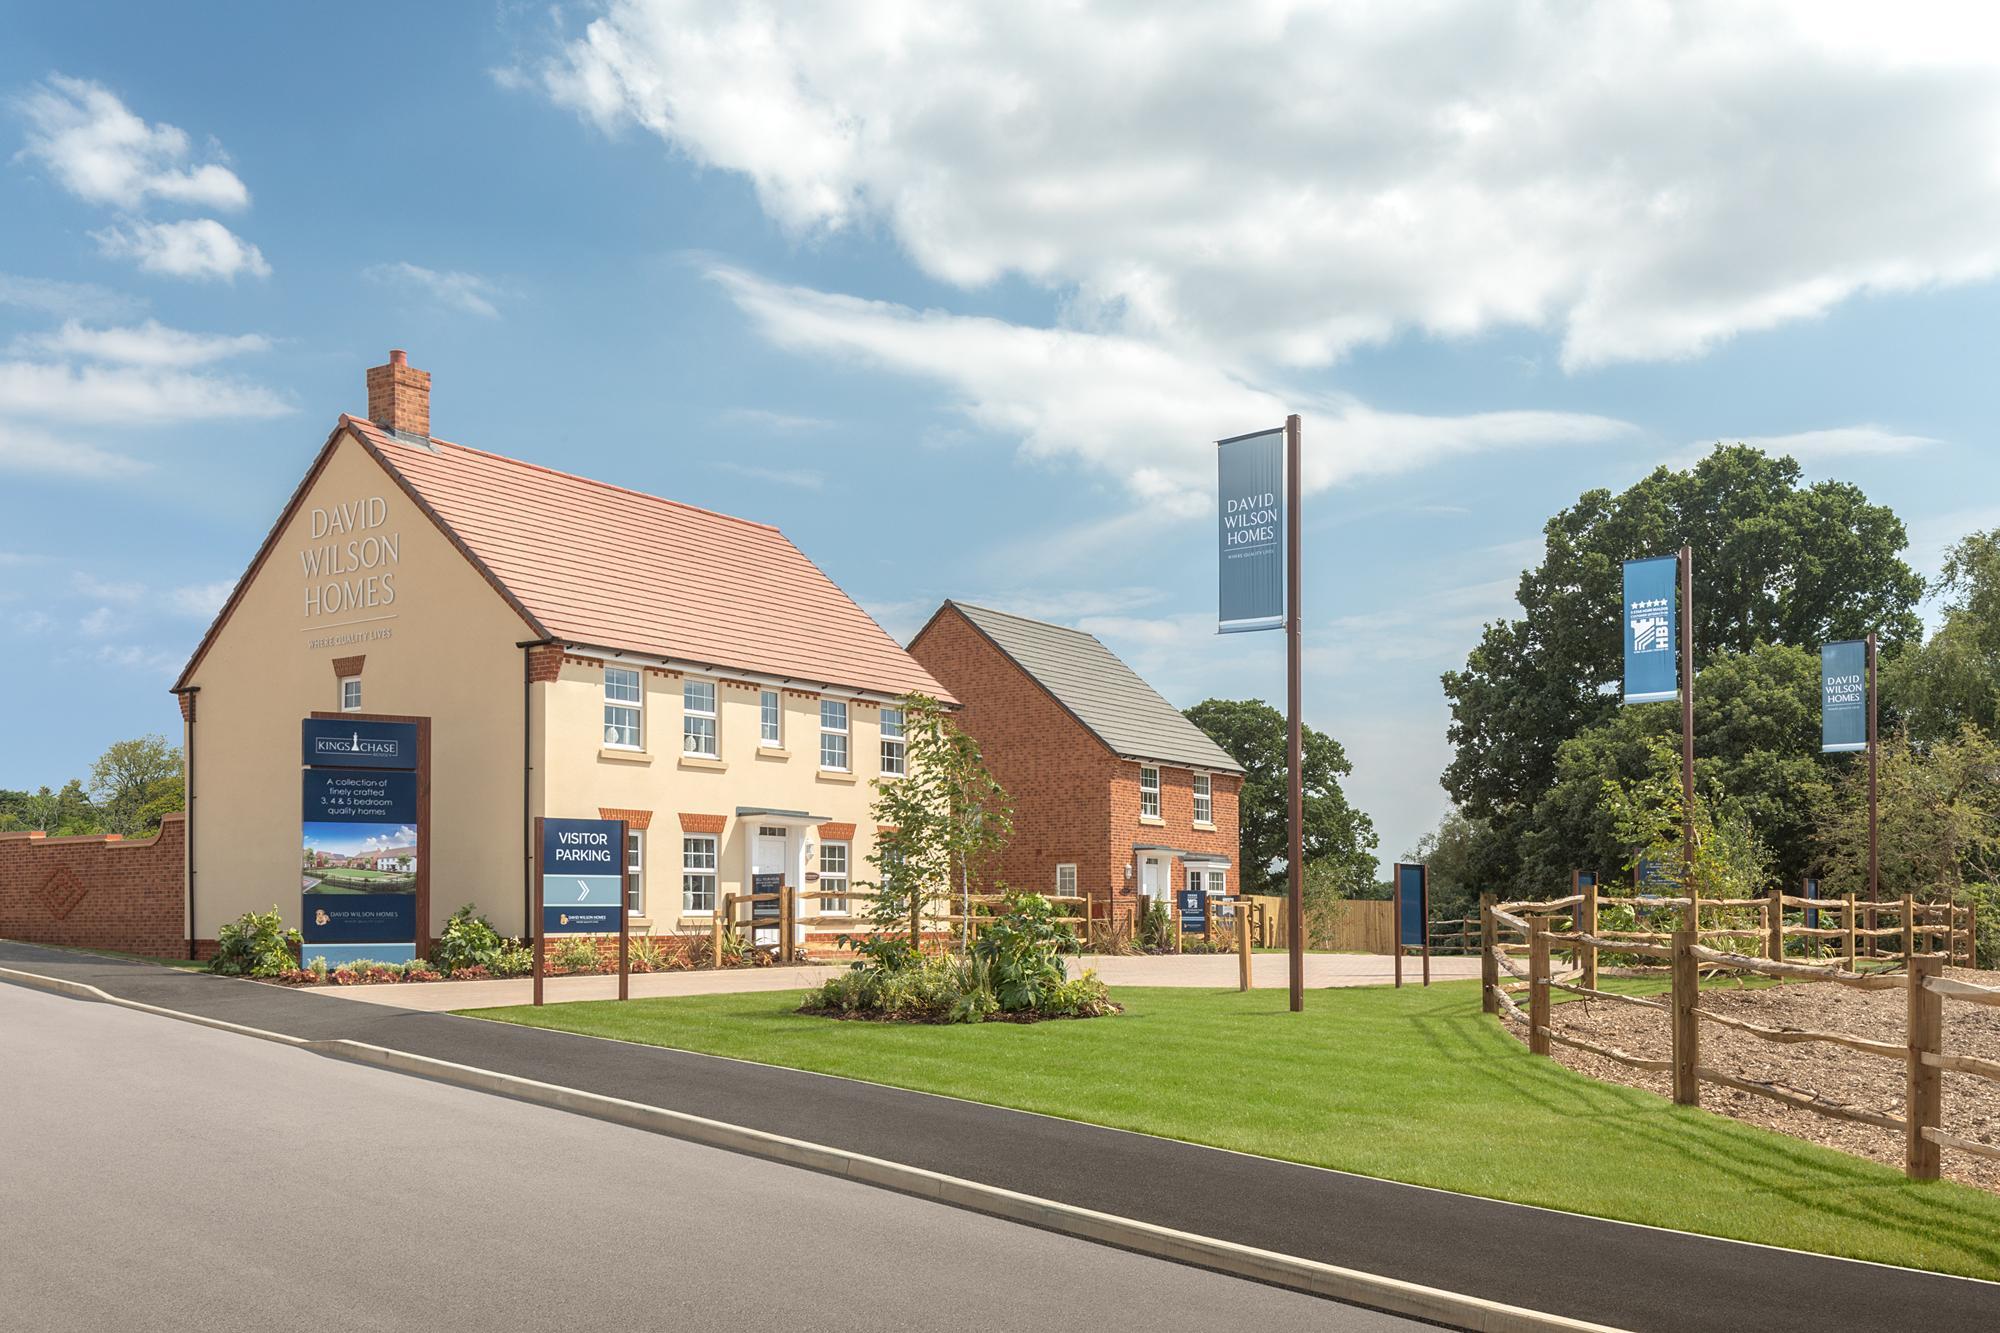 New Build Homes in Braishfield